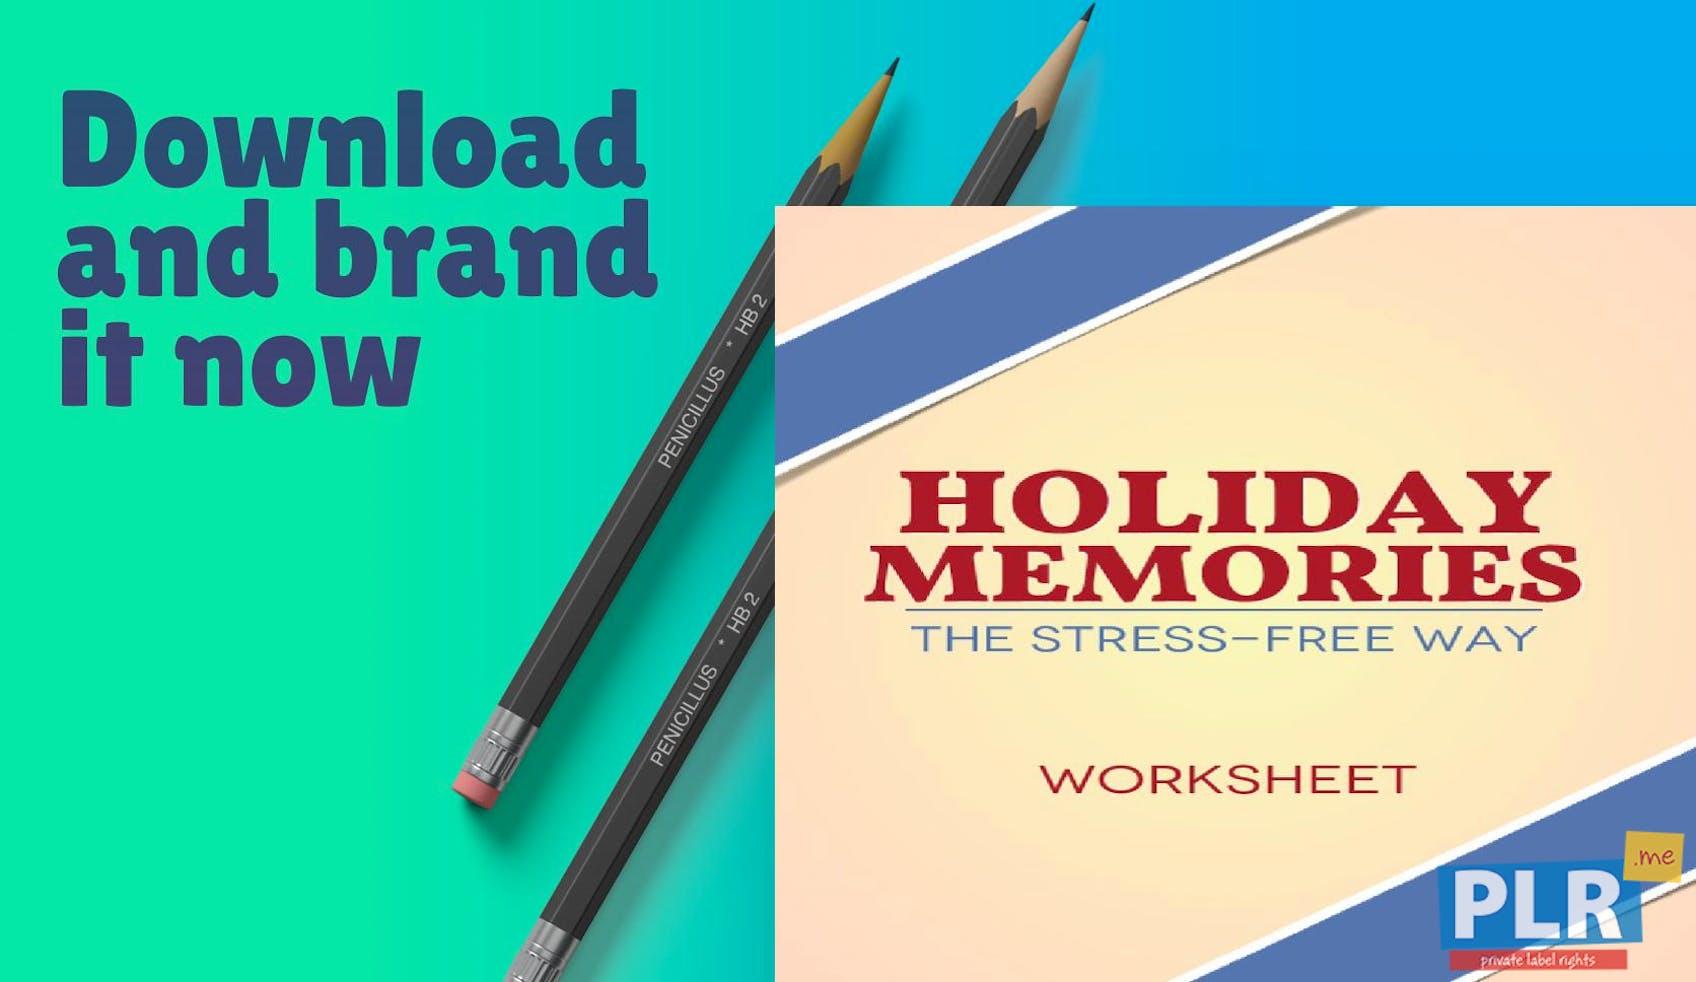 PLR Worksheets - Holiday Memories The Stress Free Way Worksheet - PLR.me